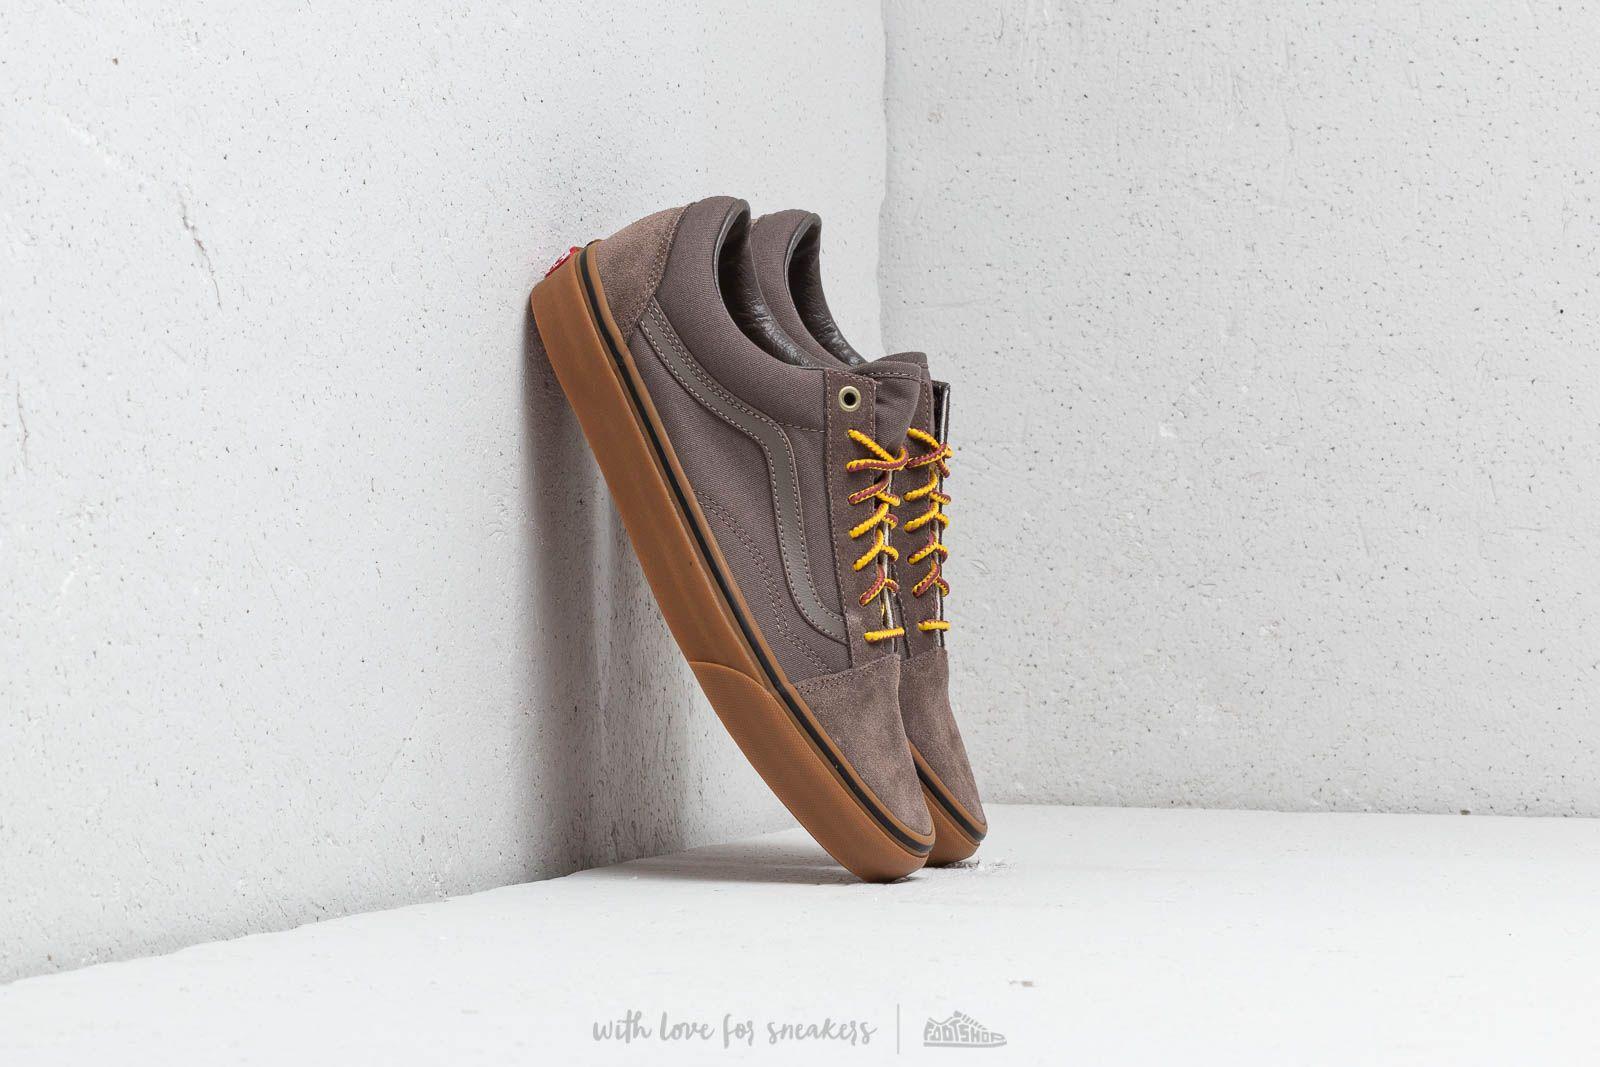 a8b957e0afcd0b Vans Old Skool Gumsole Falcon  Boot Lace